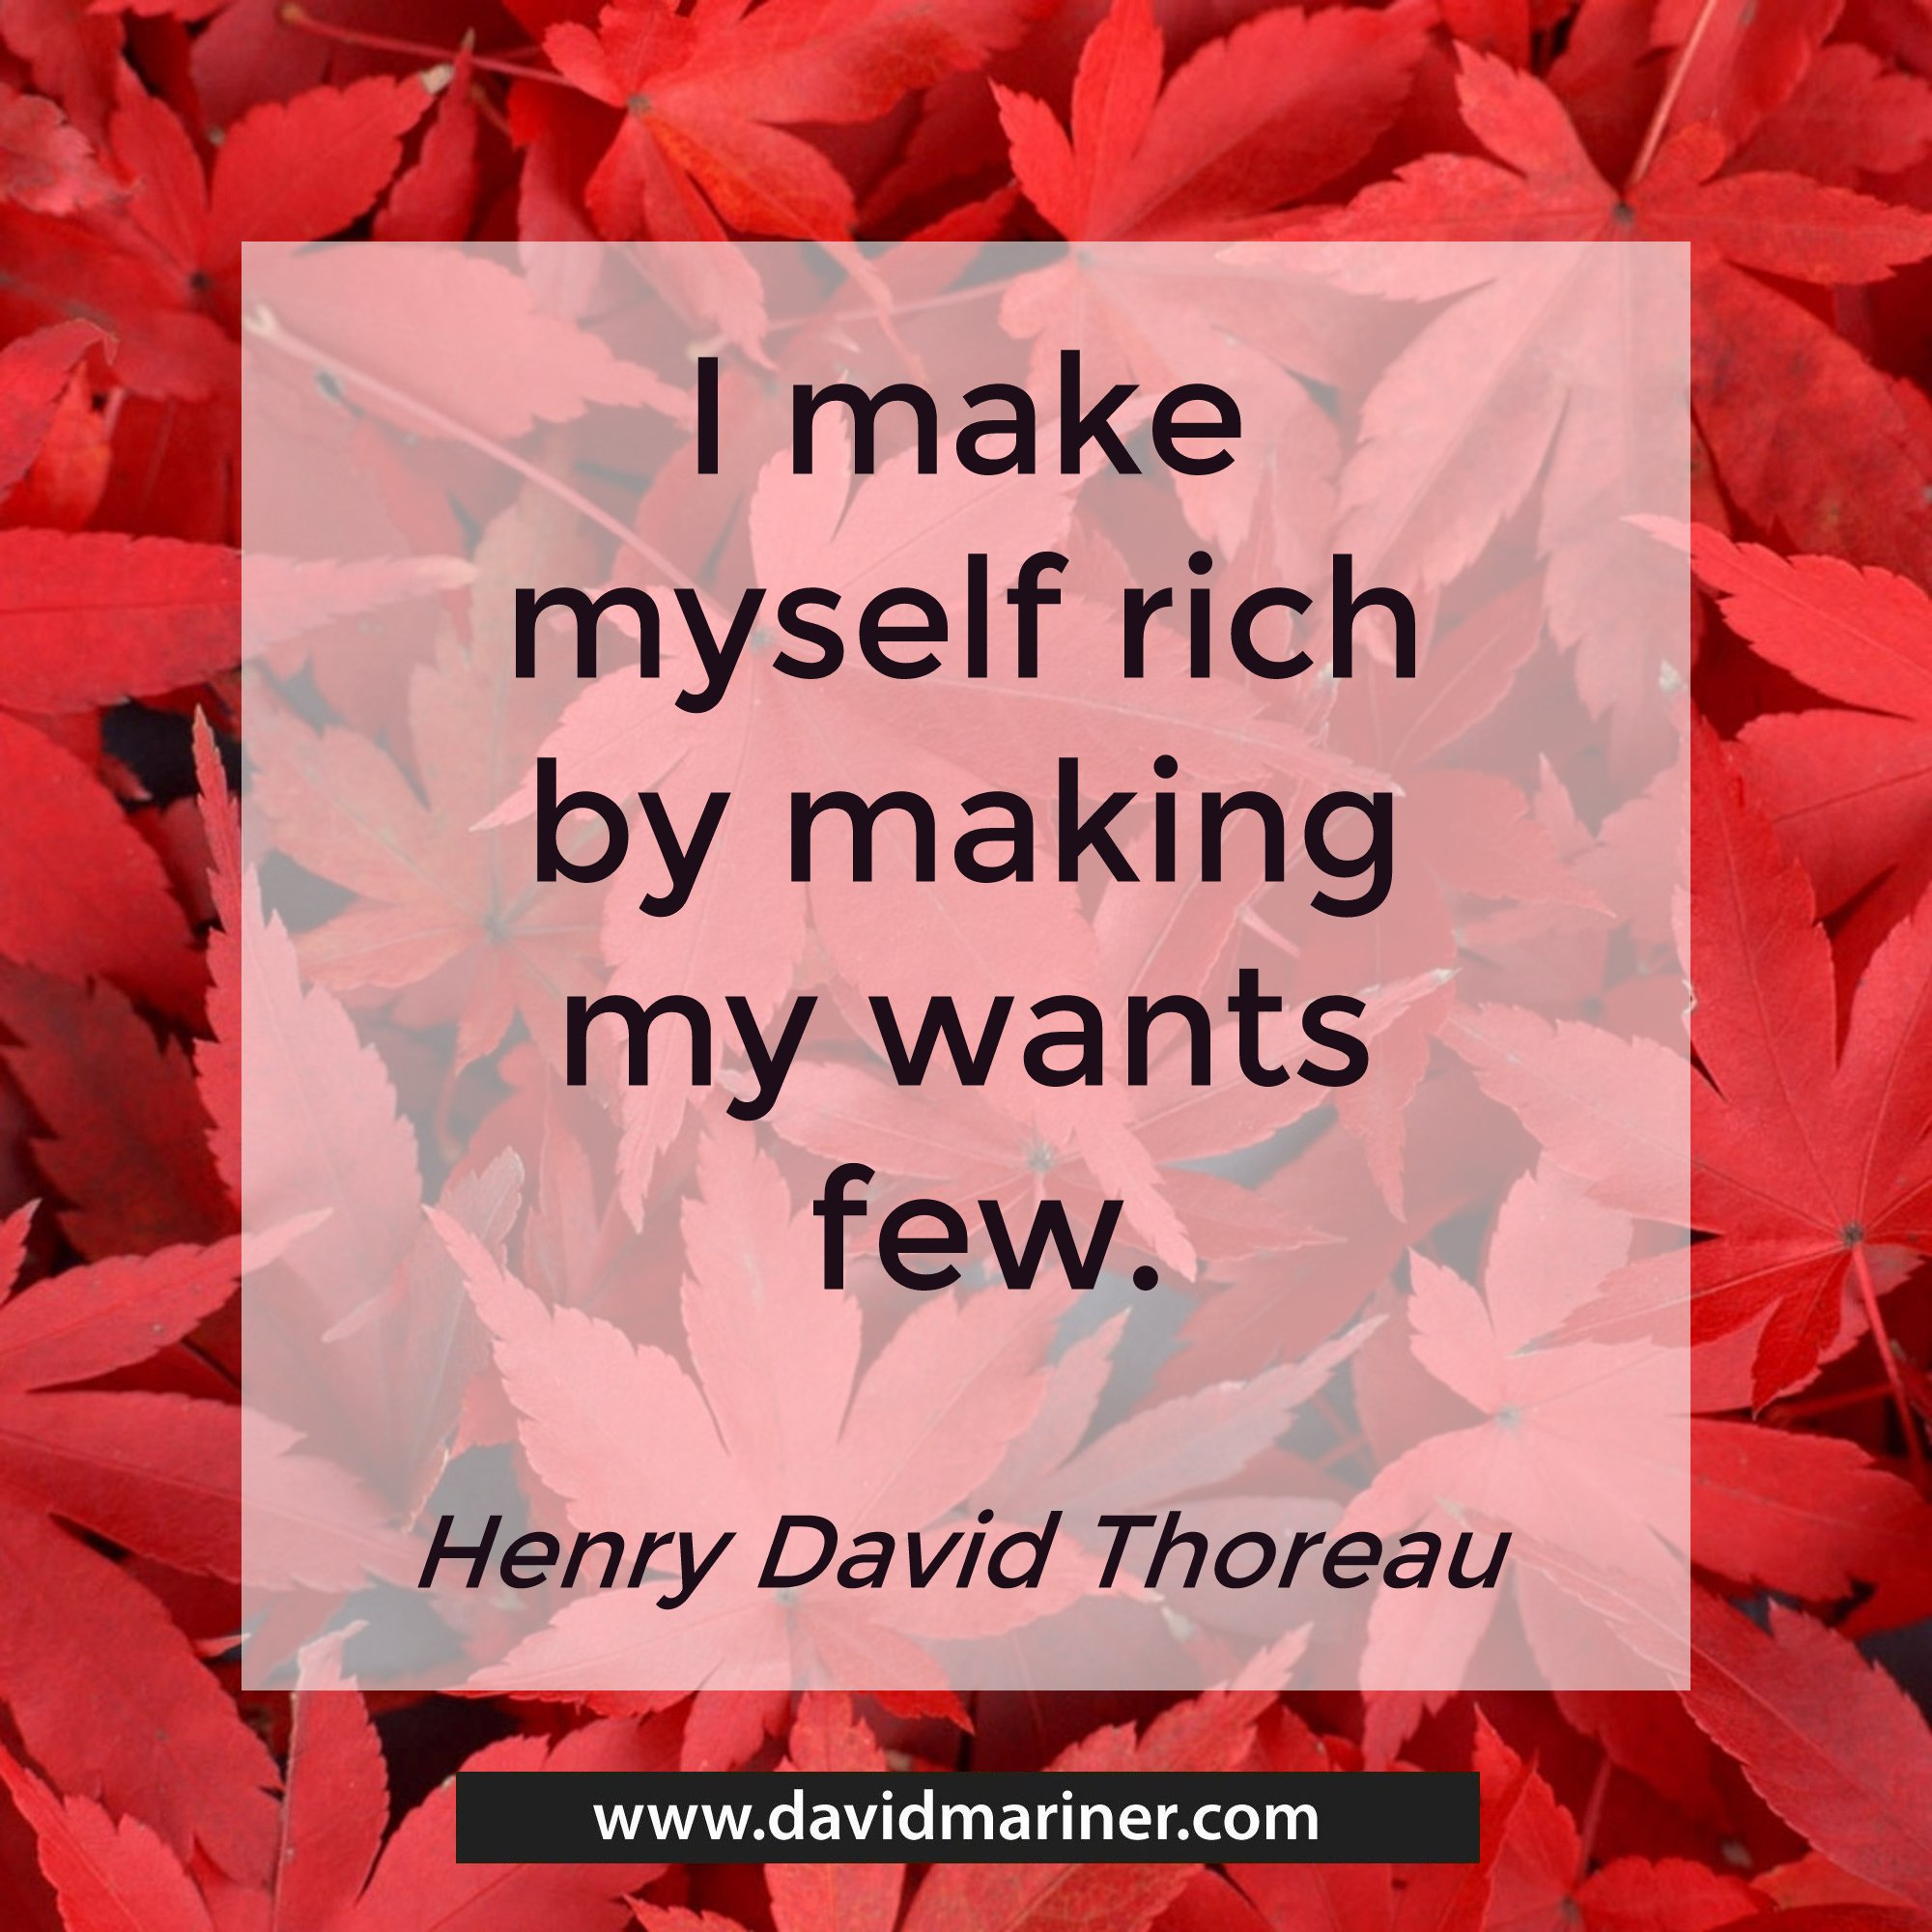 I make myself rich by making my wants few. - Henry David Thoreau